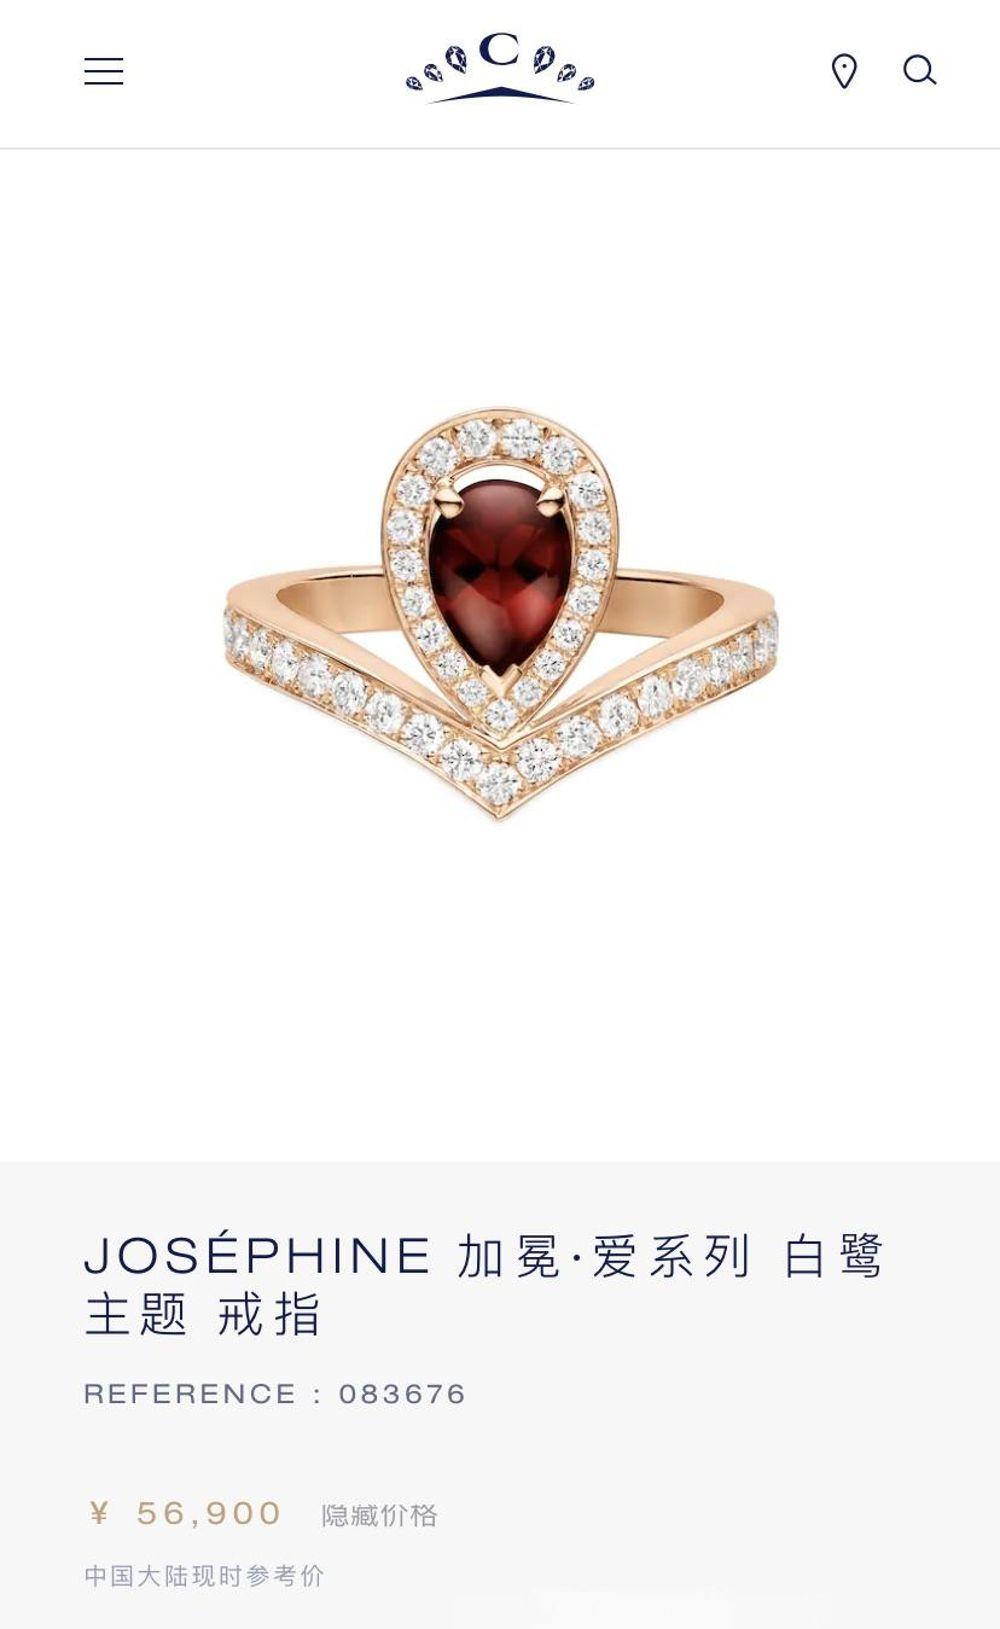 Chaumet尚美JOSEPHINE 加冕·爱系列 白鹭083676 18k玫瑰金1克拉